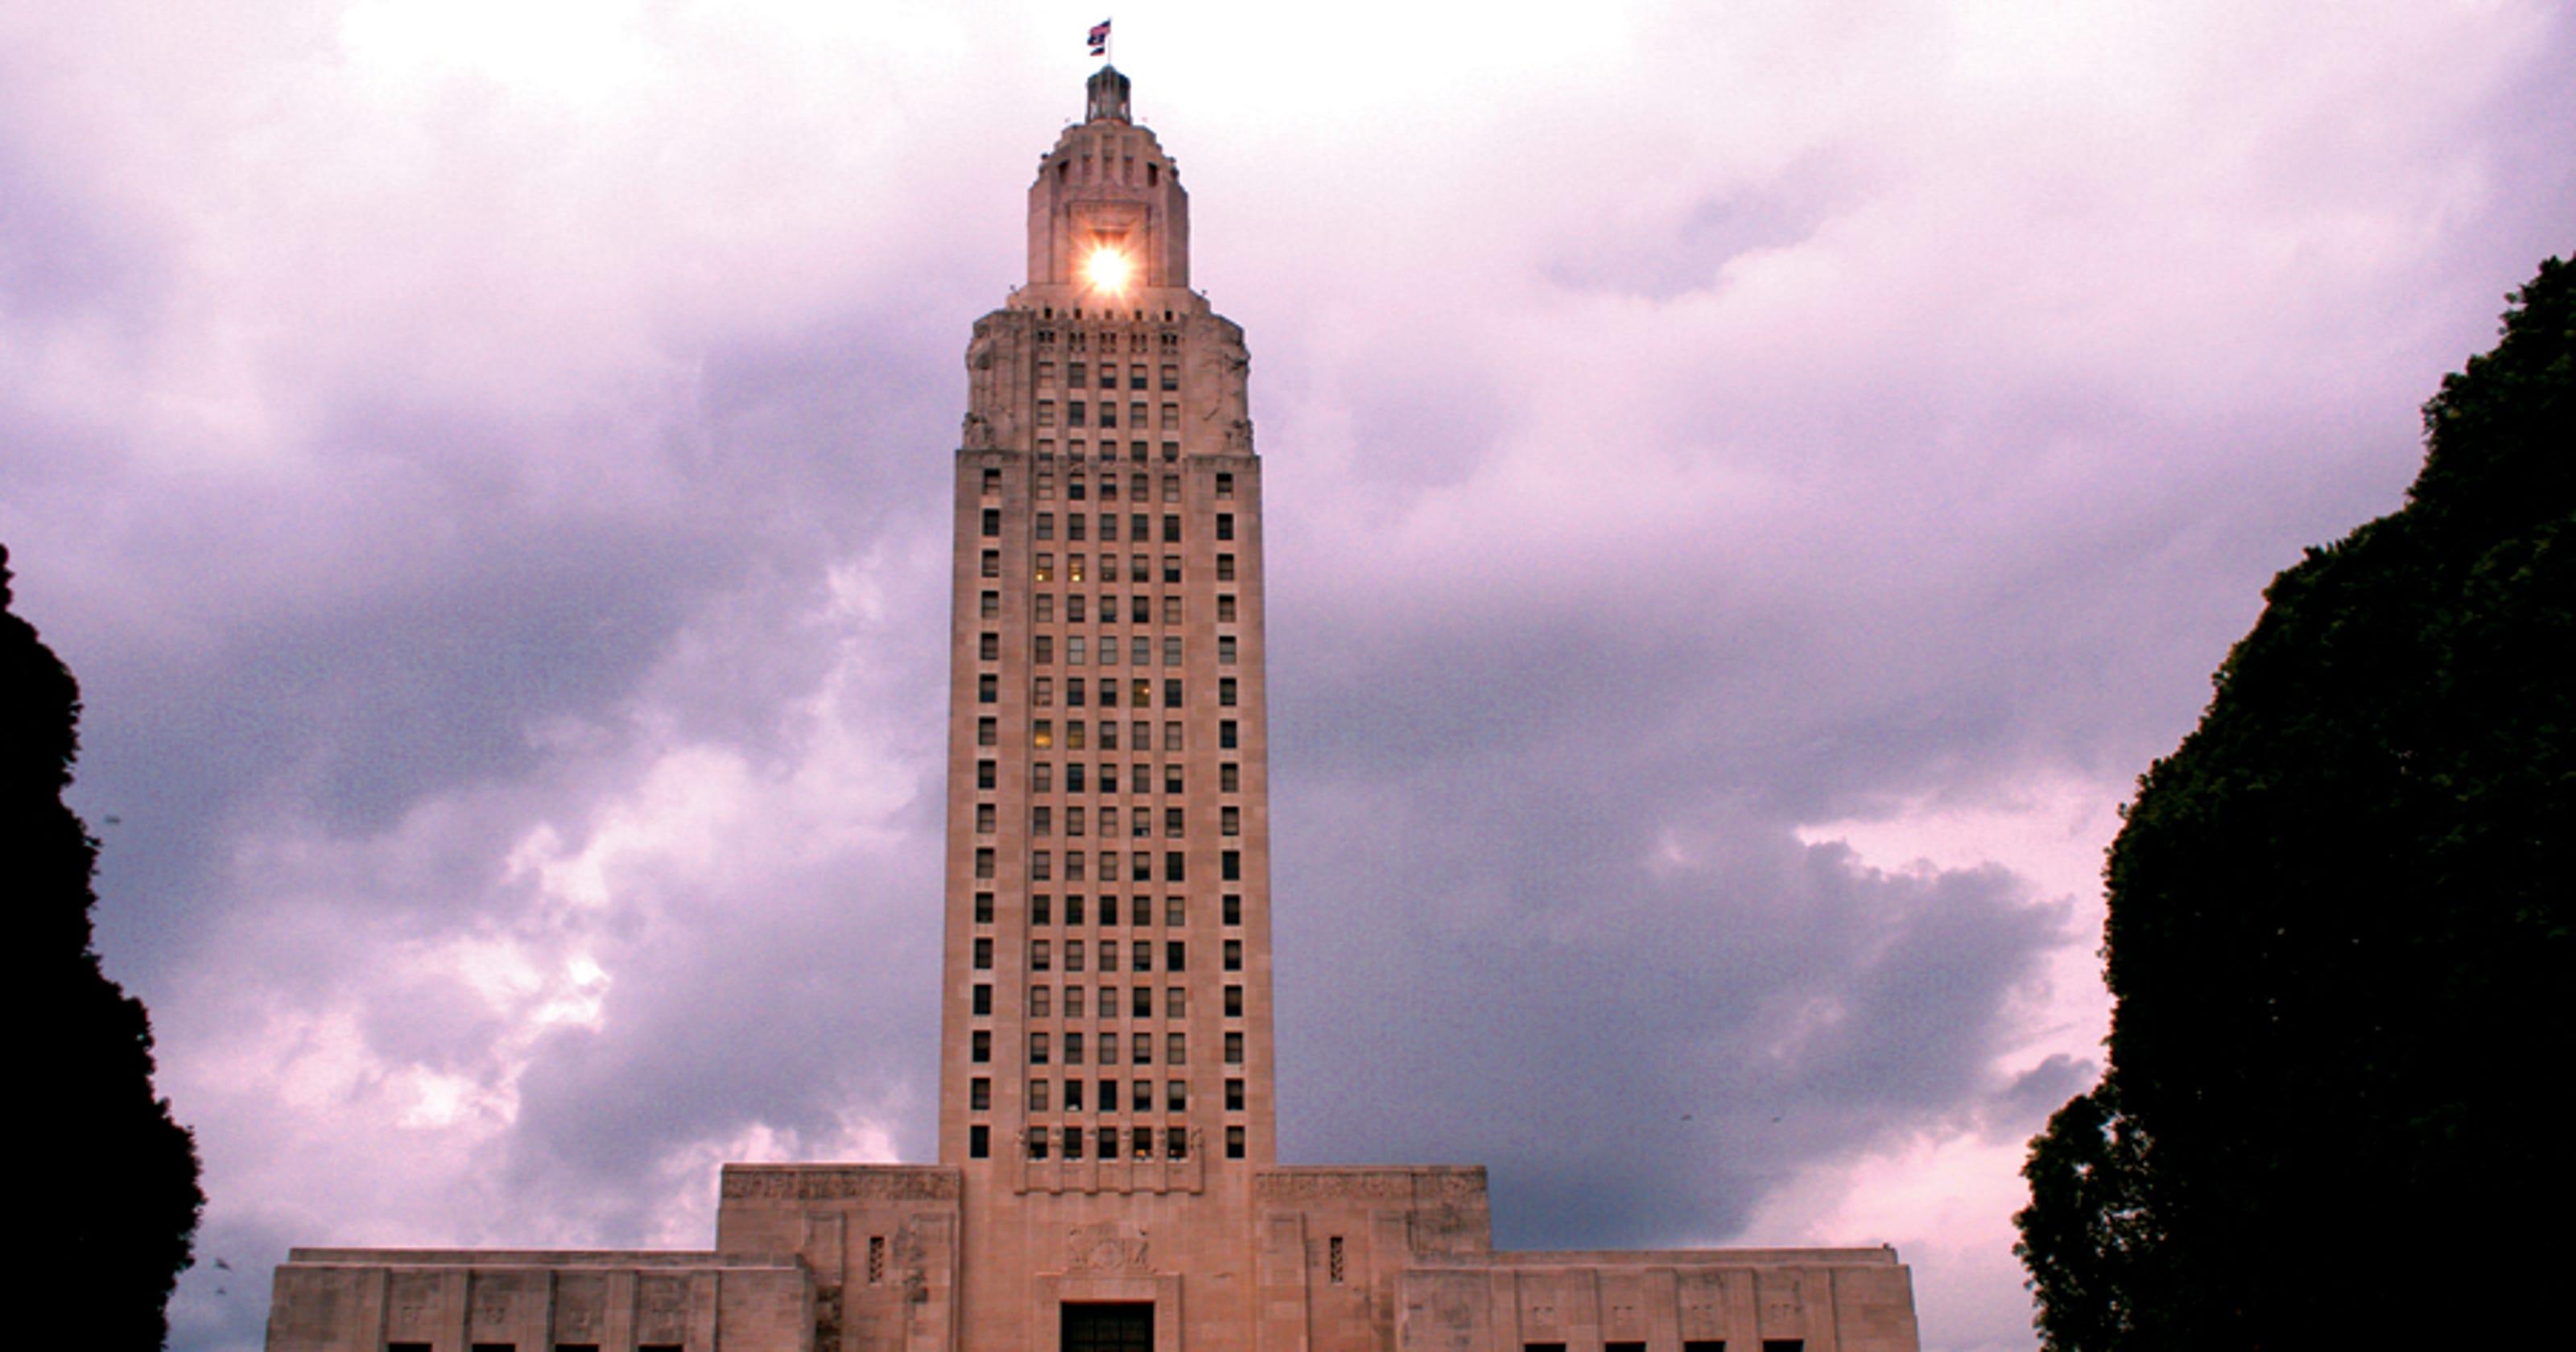 lawrence versus texas